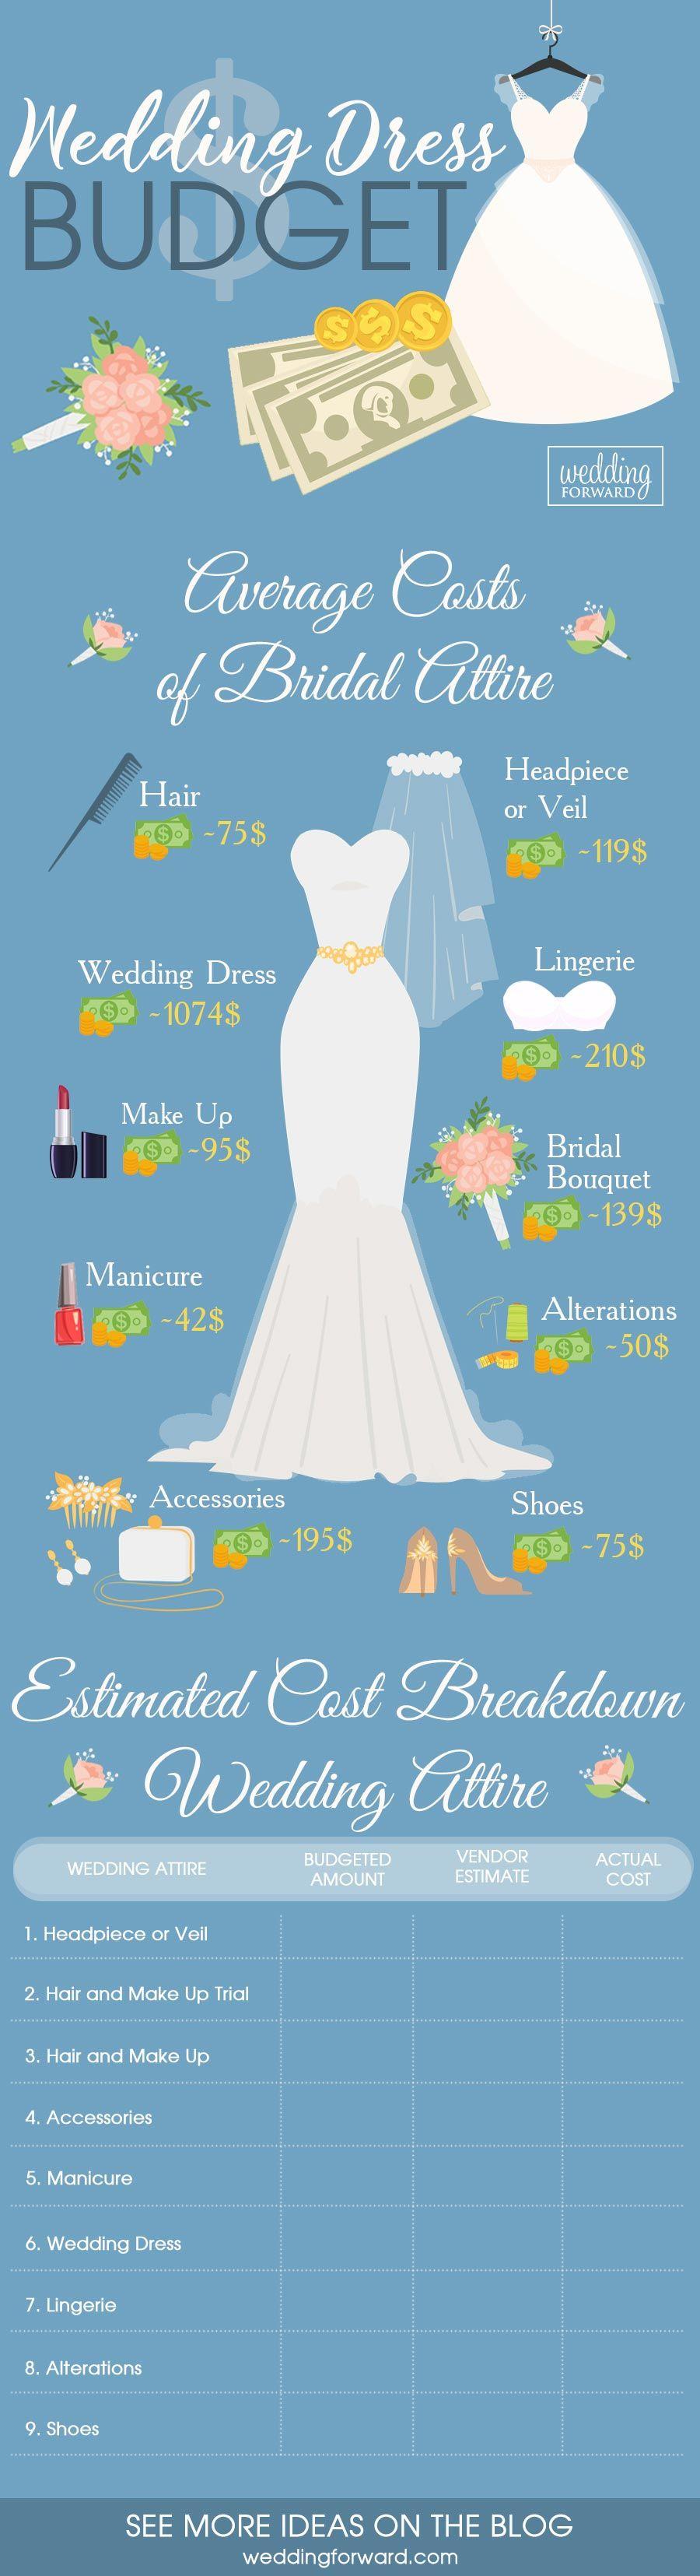 12 Wedding Dress Infographics To Make Your Shopping Easier ...